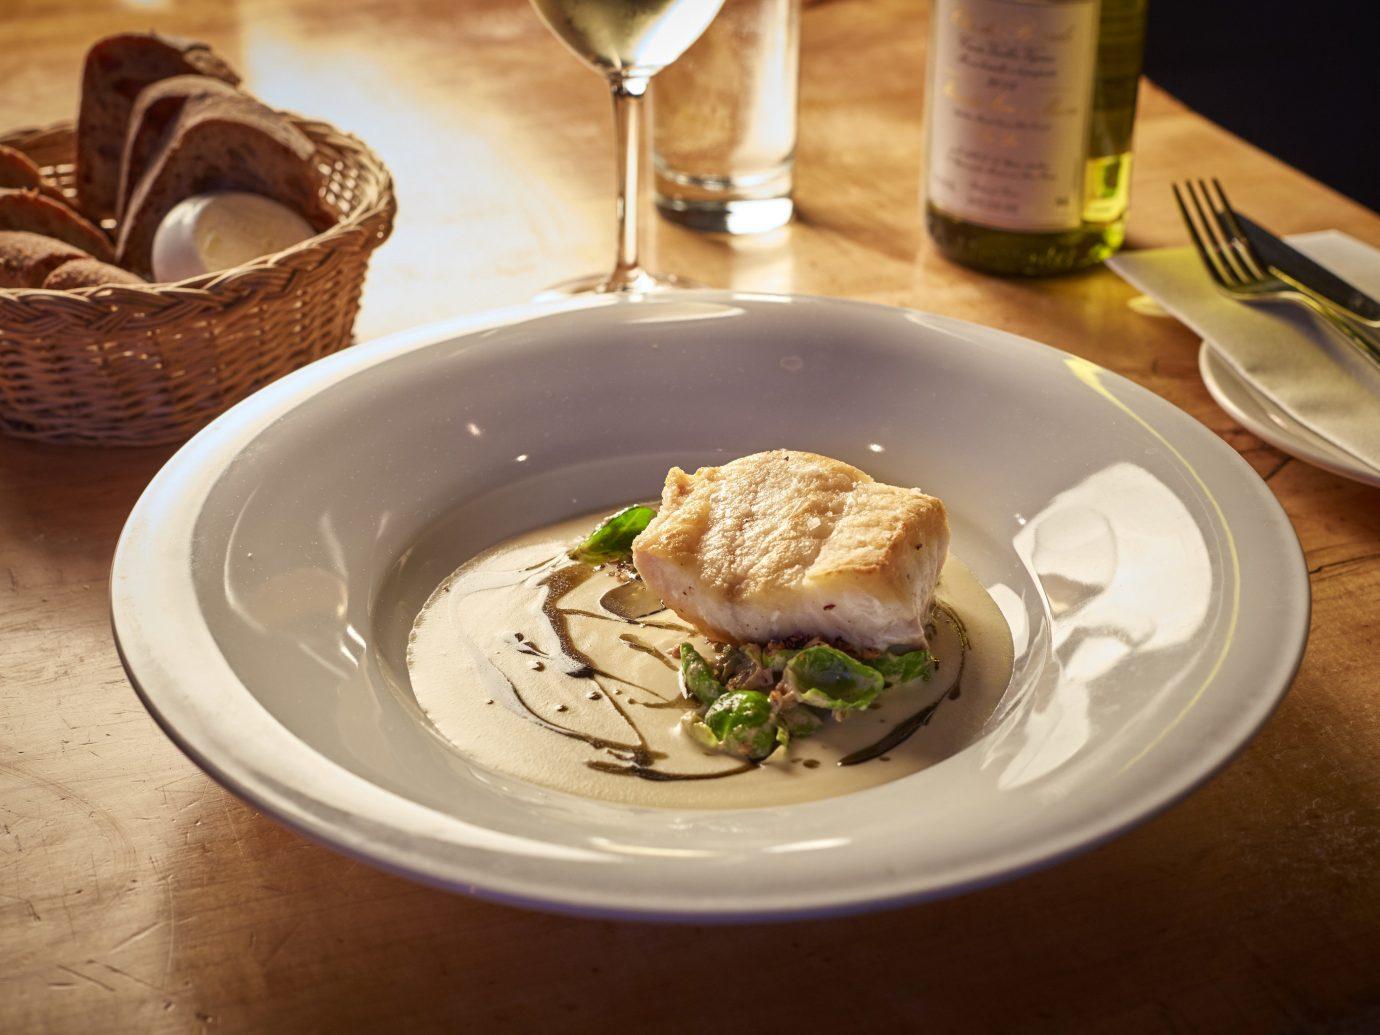 Food + Drink plate table food dish meal breakfast produce cuisine restaurant lunch vegetable meat piece de resistance